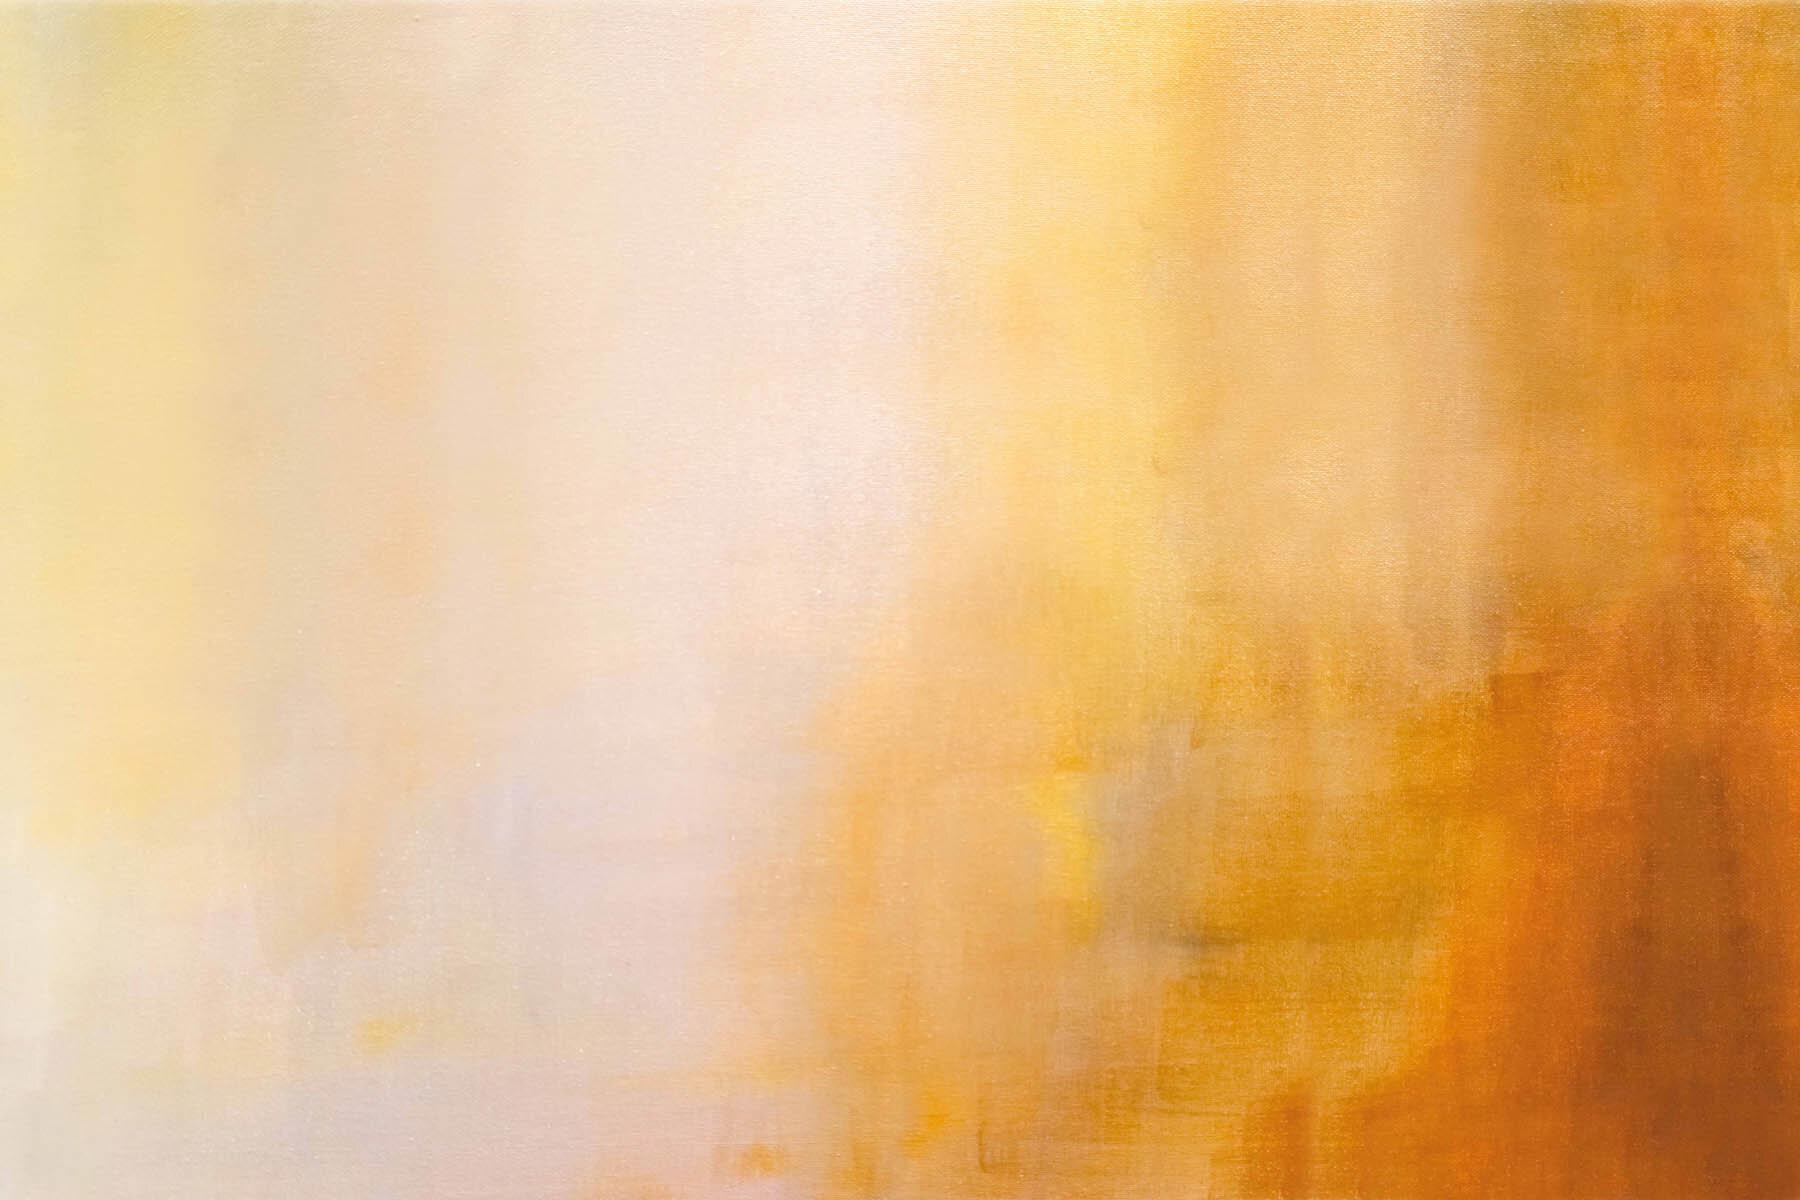 PlateART Duschrückwand mit Motiv Design Leinwand Orange